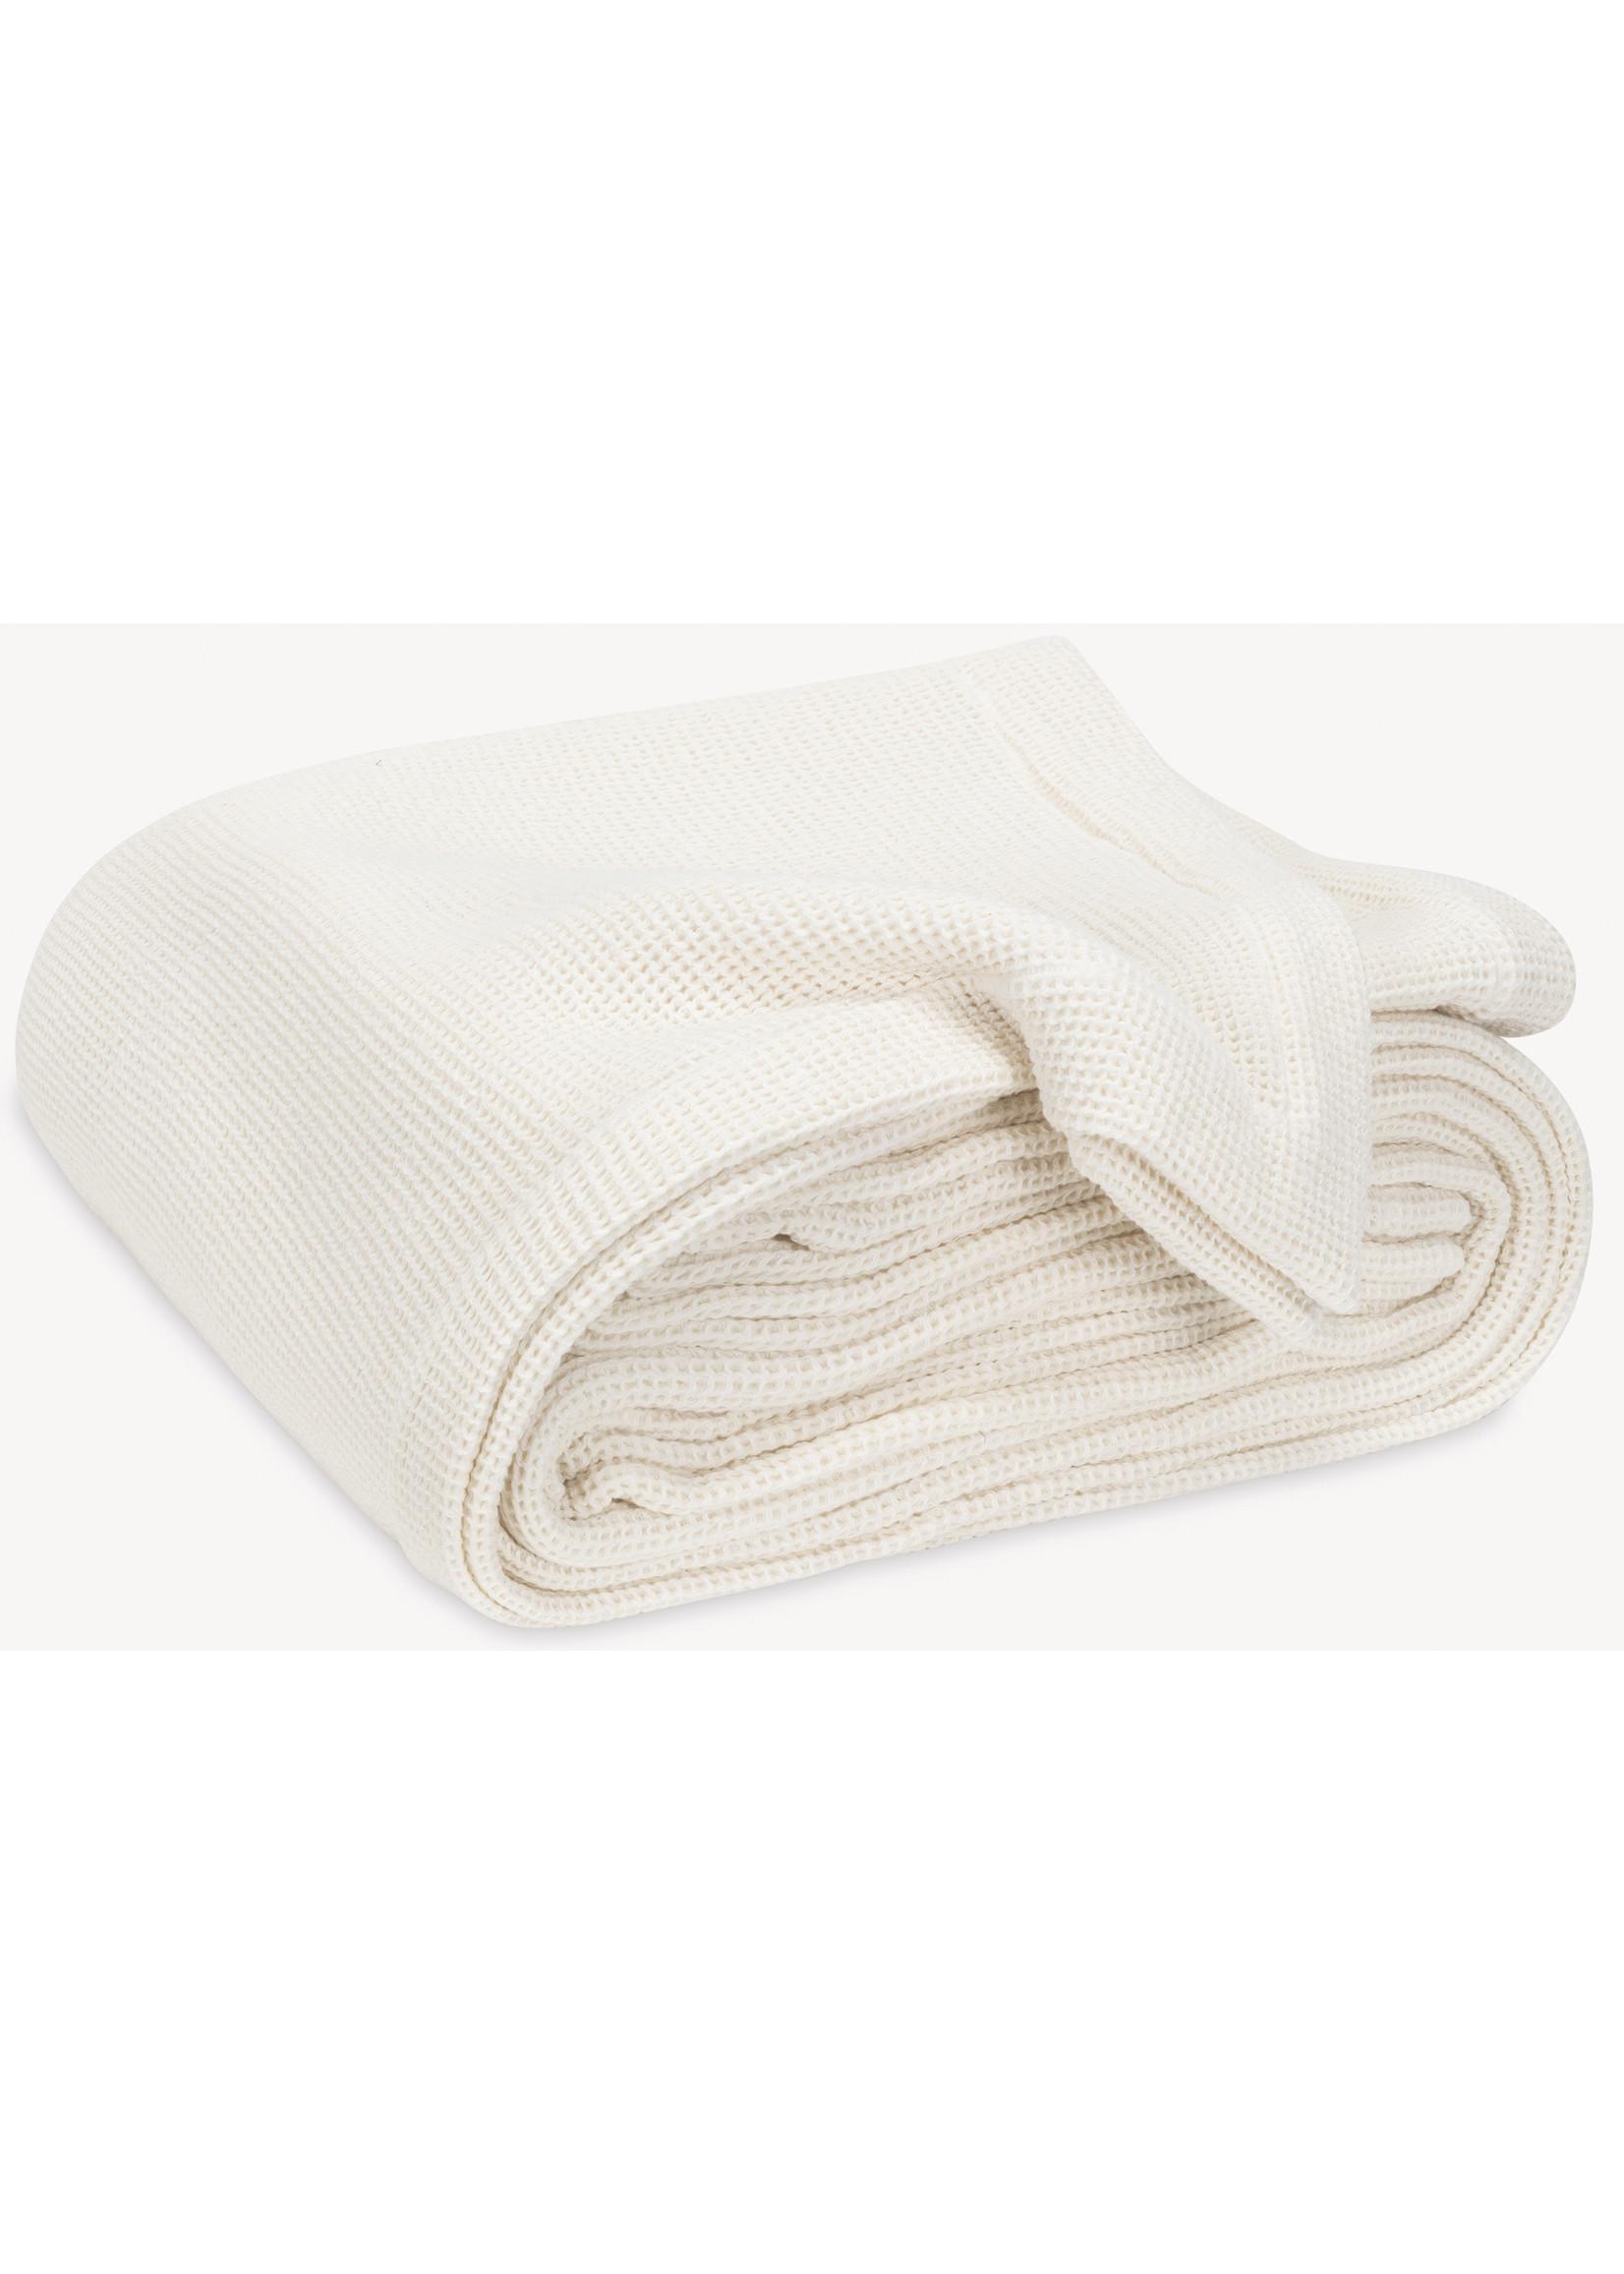 Matouk Ando Blankets